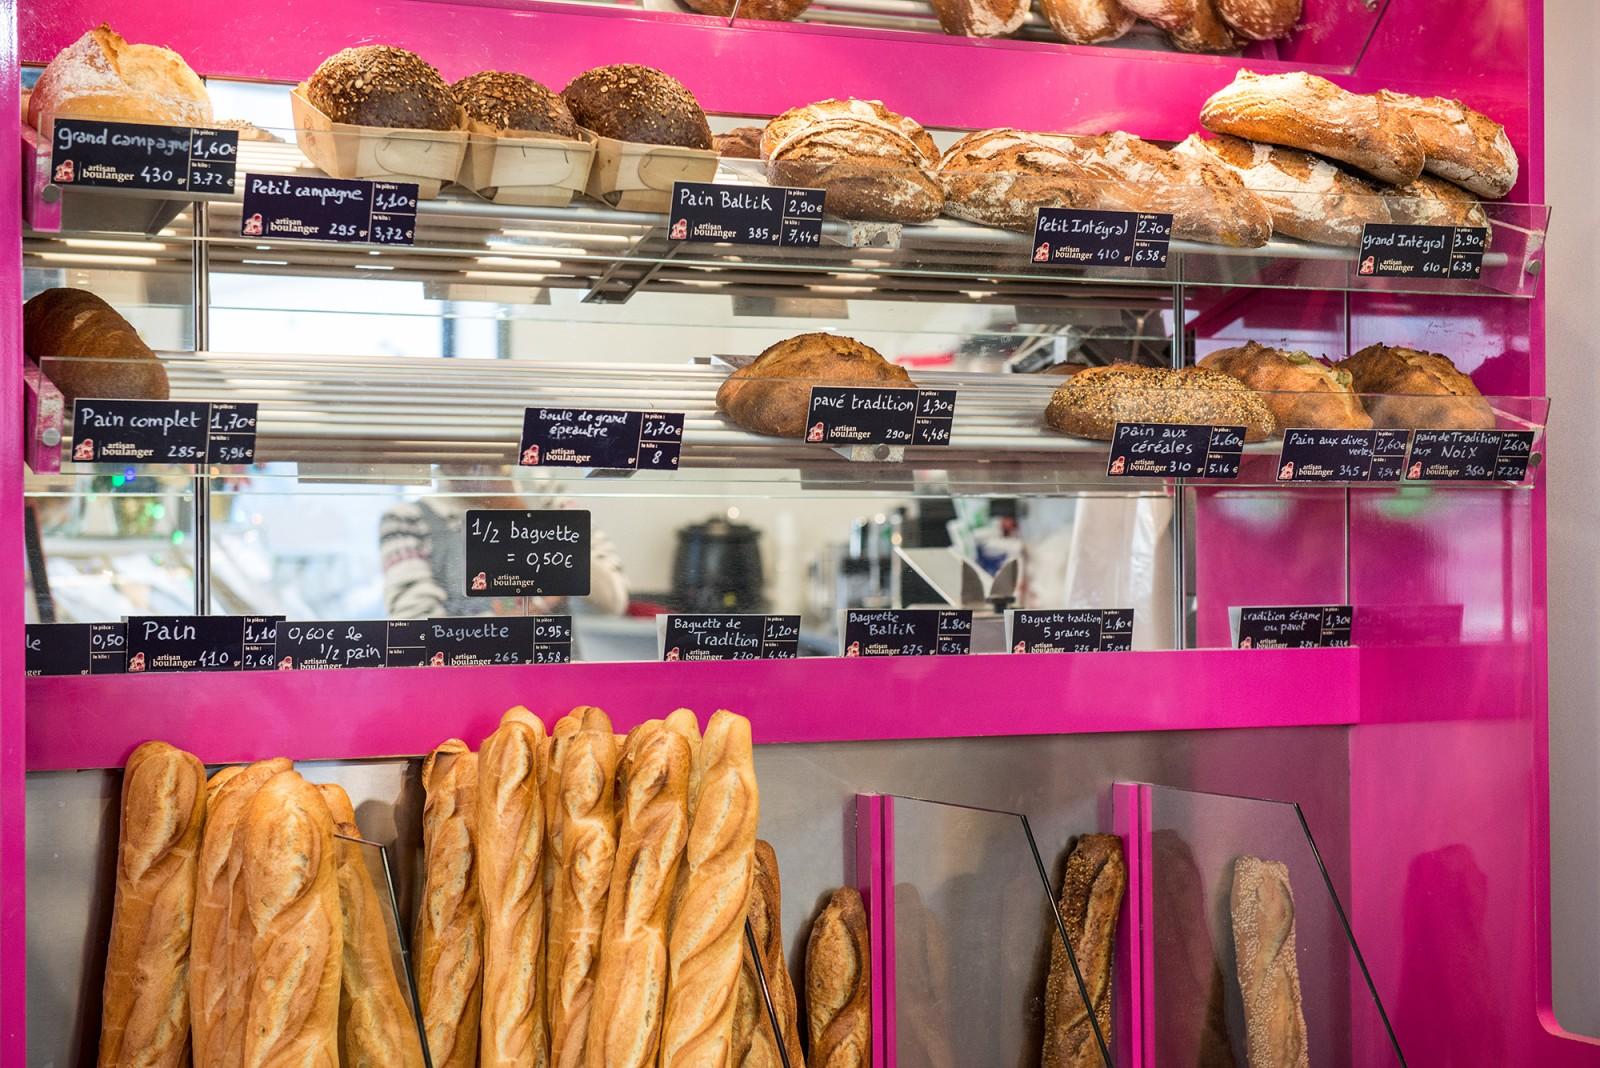 10-11-16 - Rue Myrha - Palmyre Roigt - Boulangerie Tembely-13